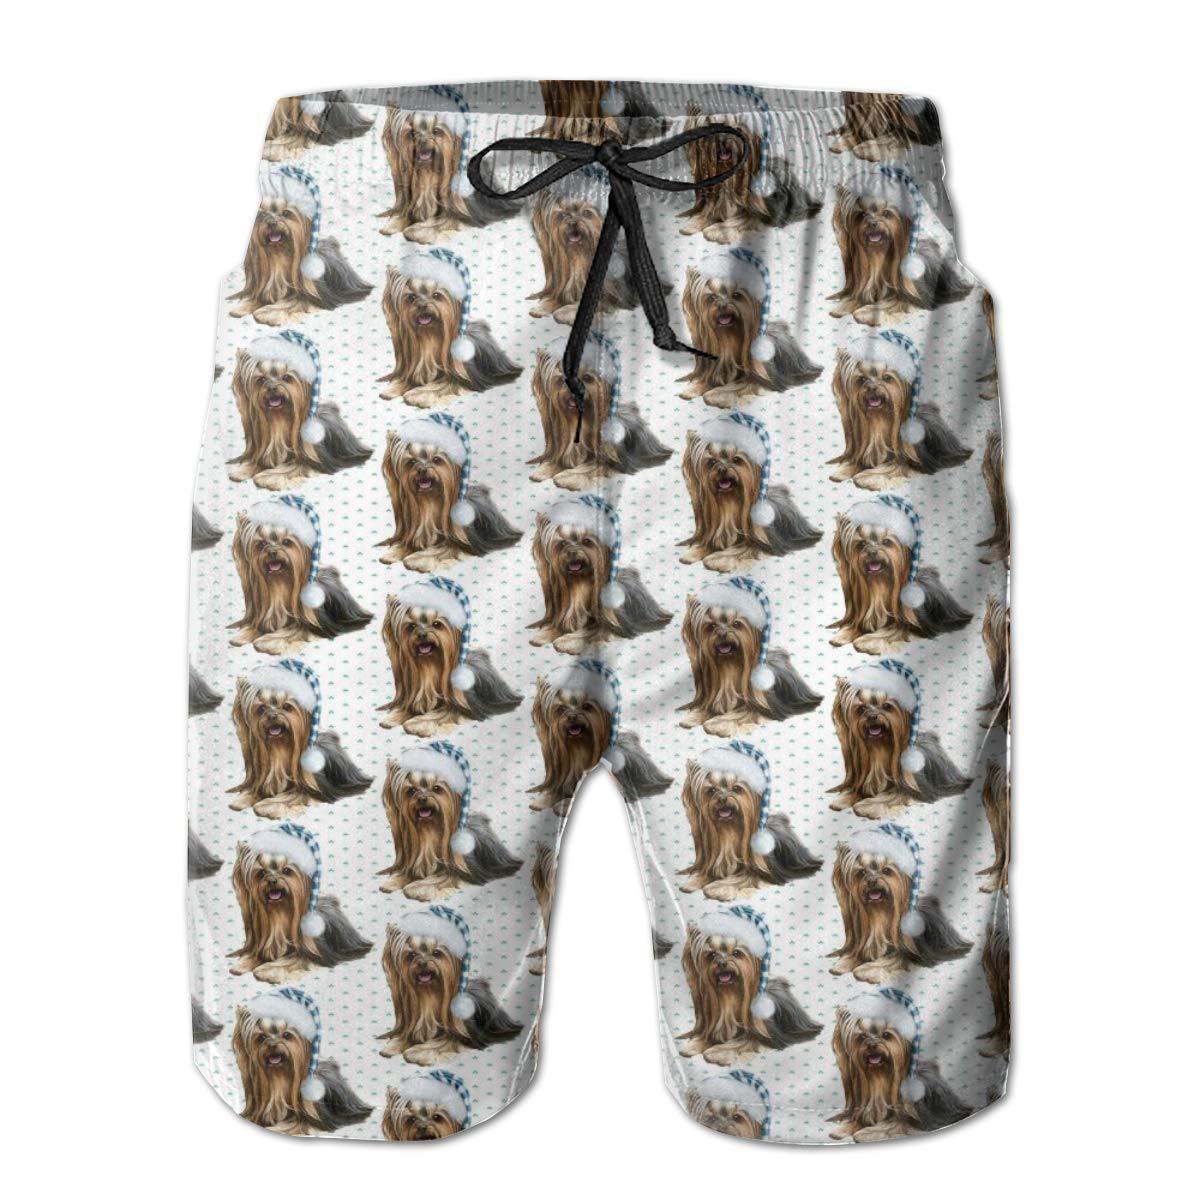 Galaxy Voyage Maltese Dog Boys Men S Swim Trunks Surf Pants 3D Swimming Trunks Board Shorts for Men